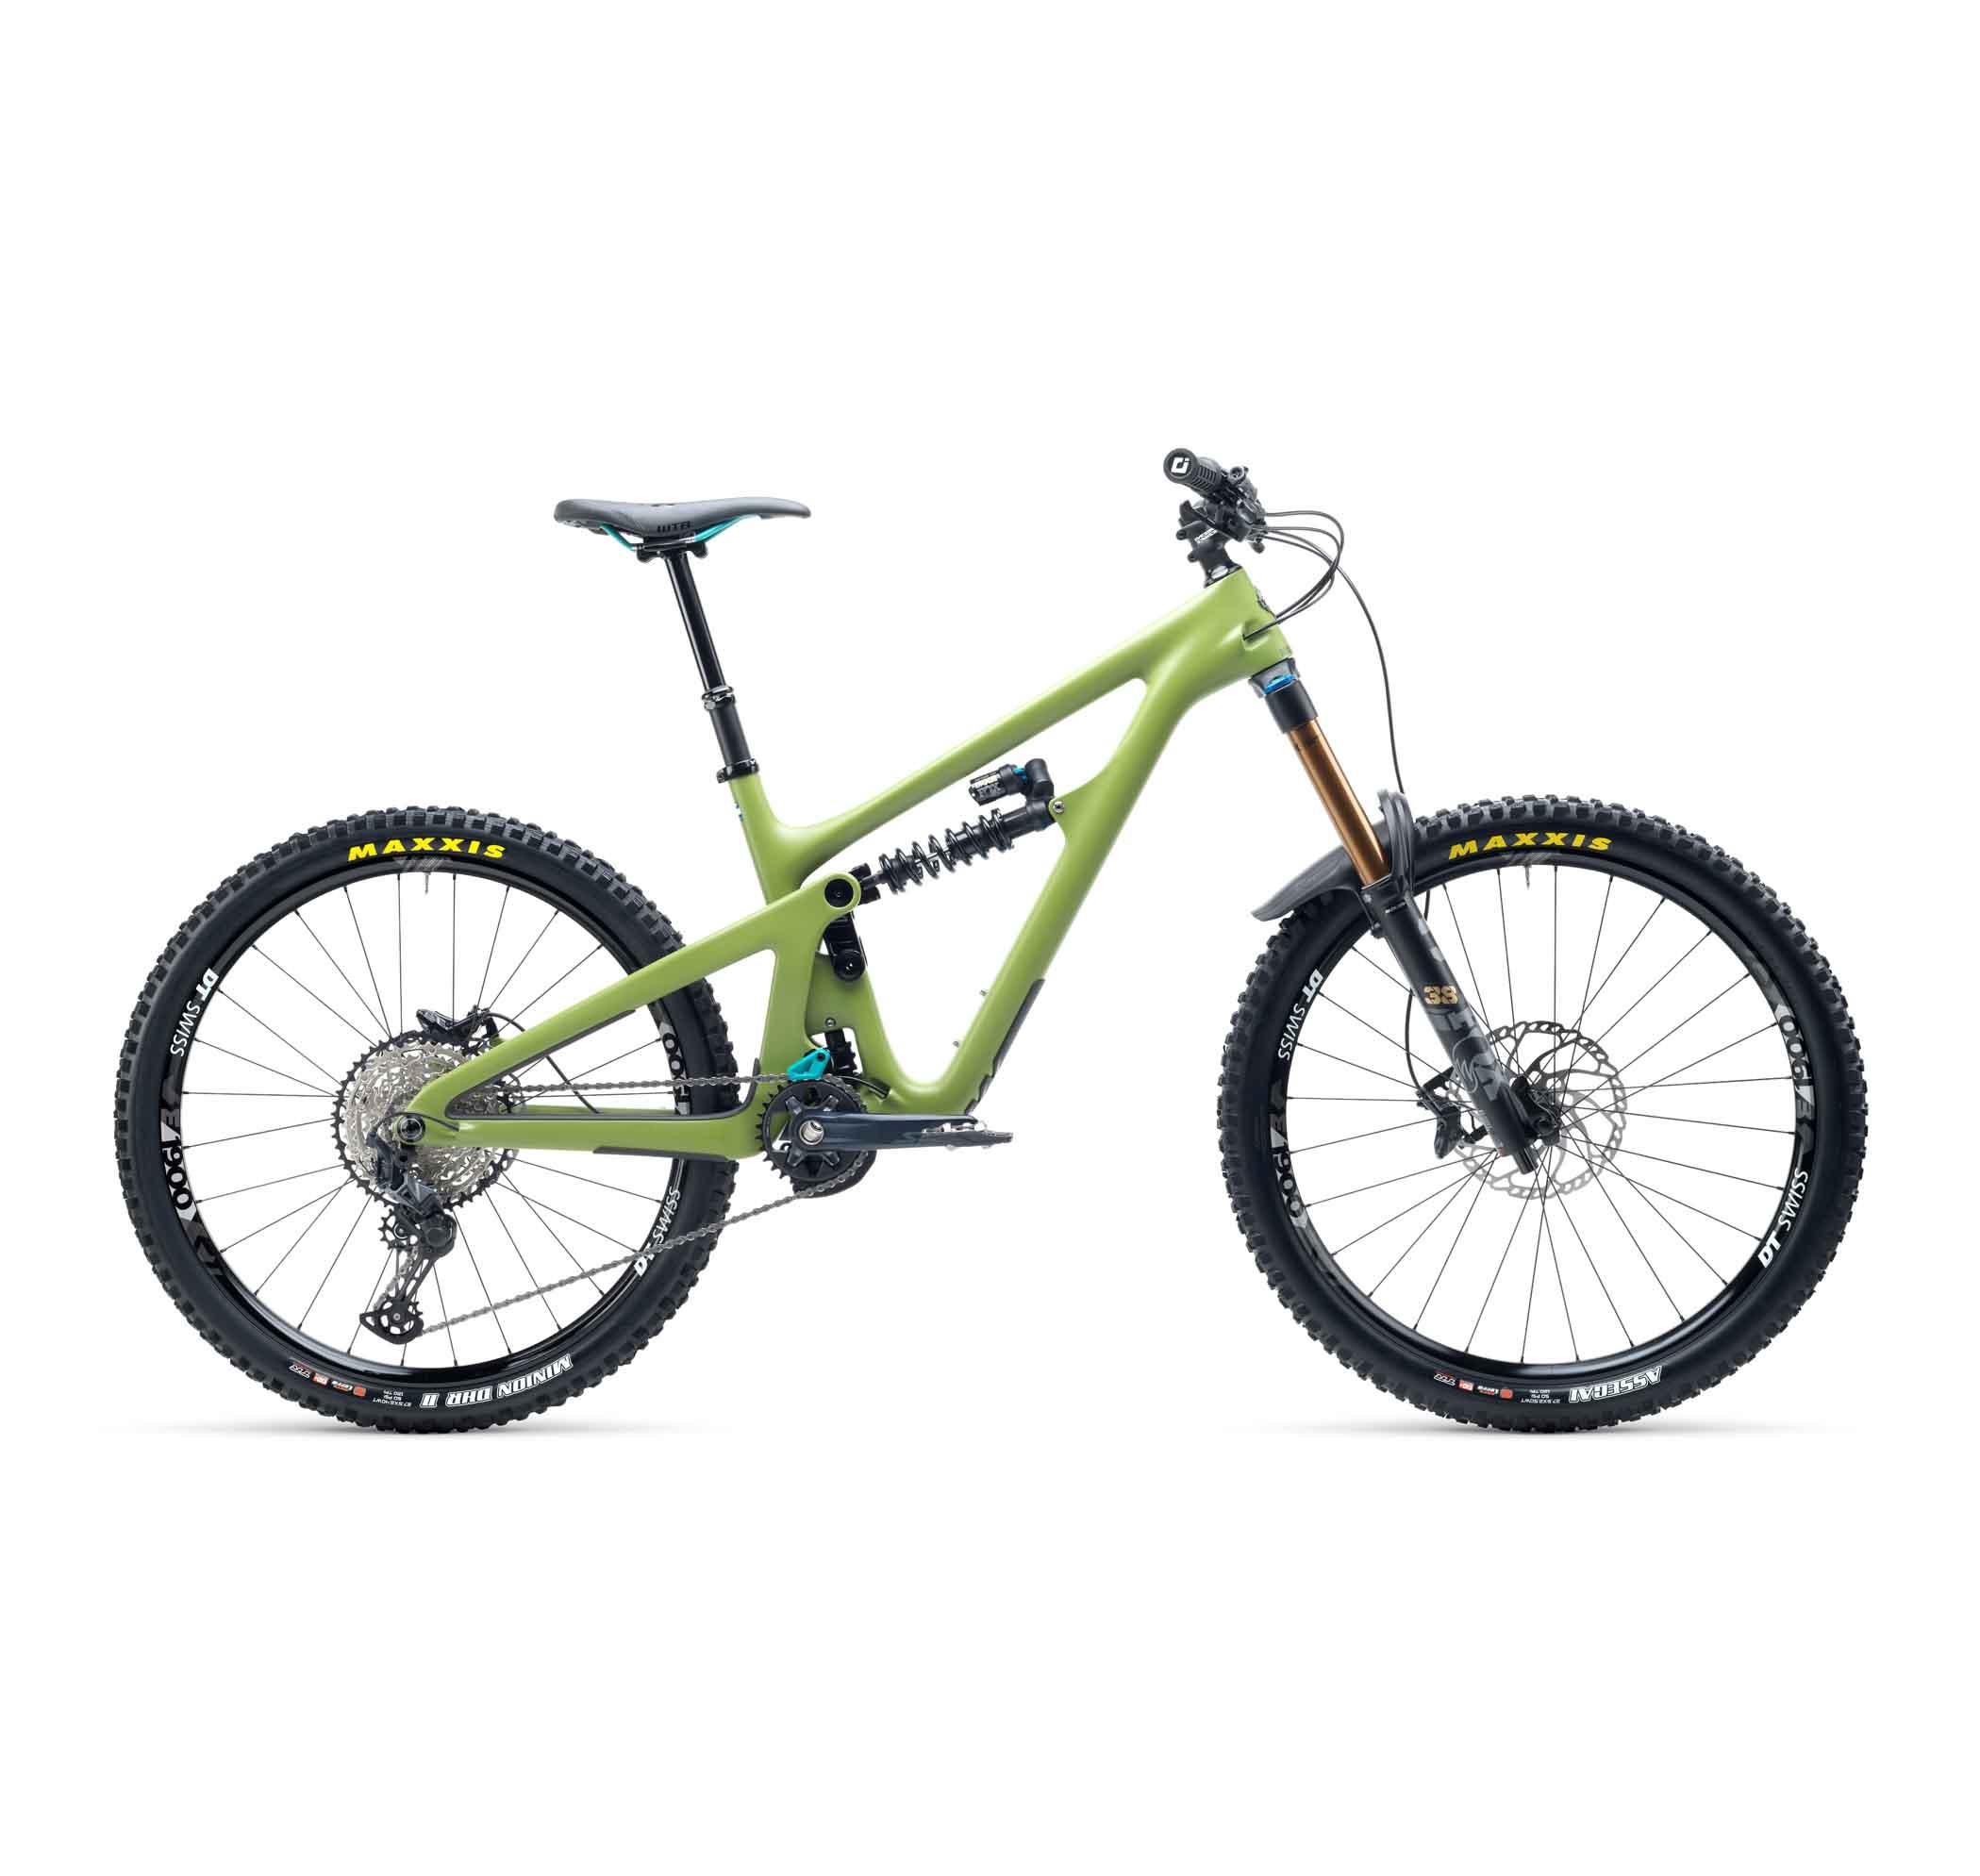 Yeti_Cycles_Rodeo_Bike_SB165_Moss